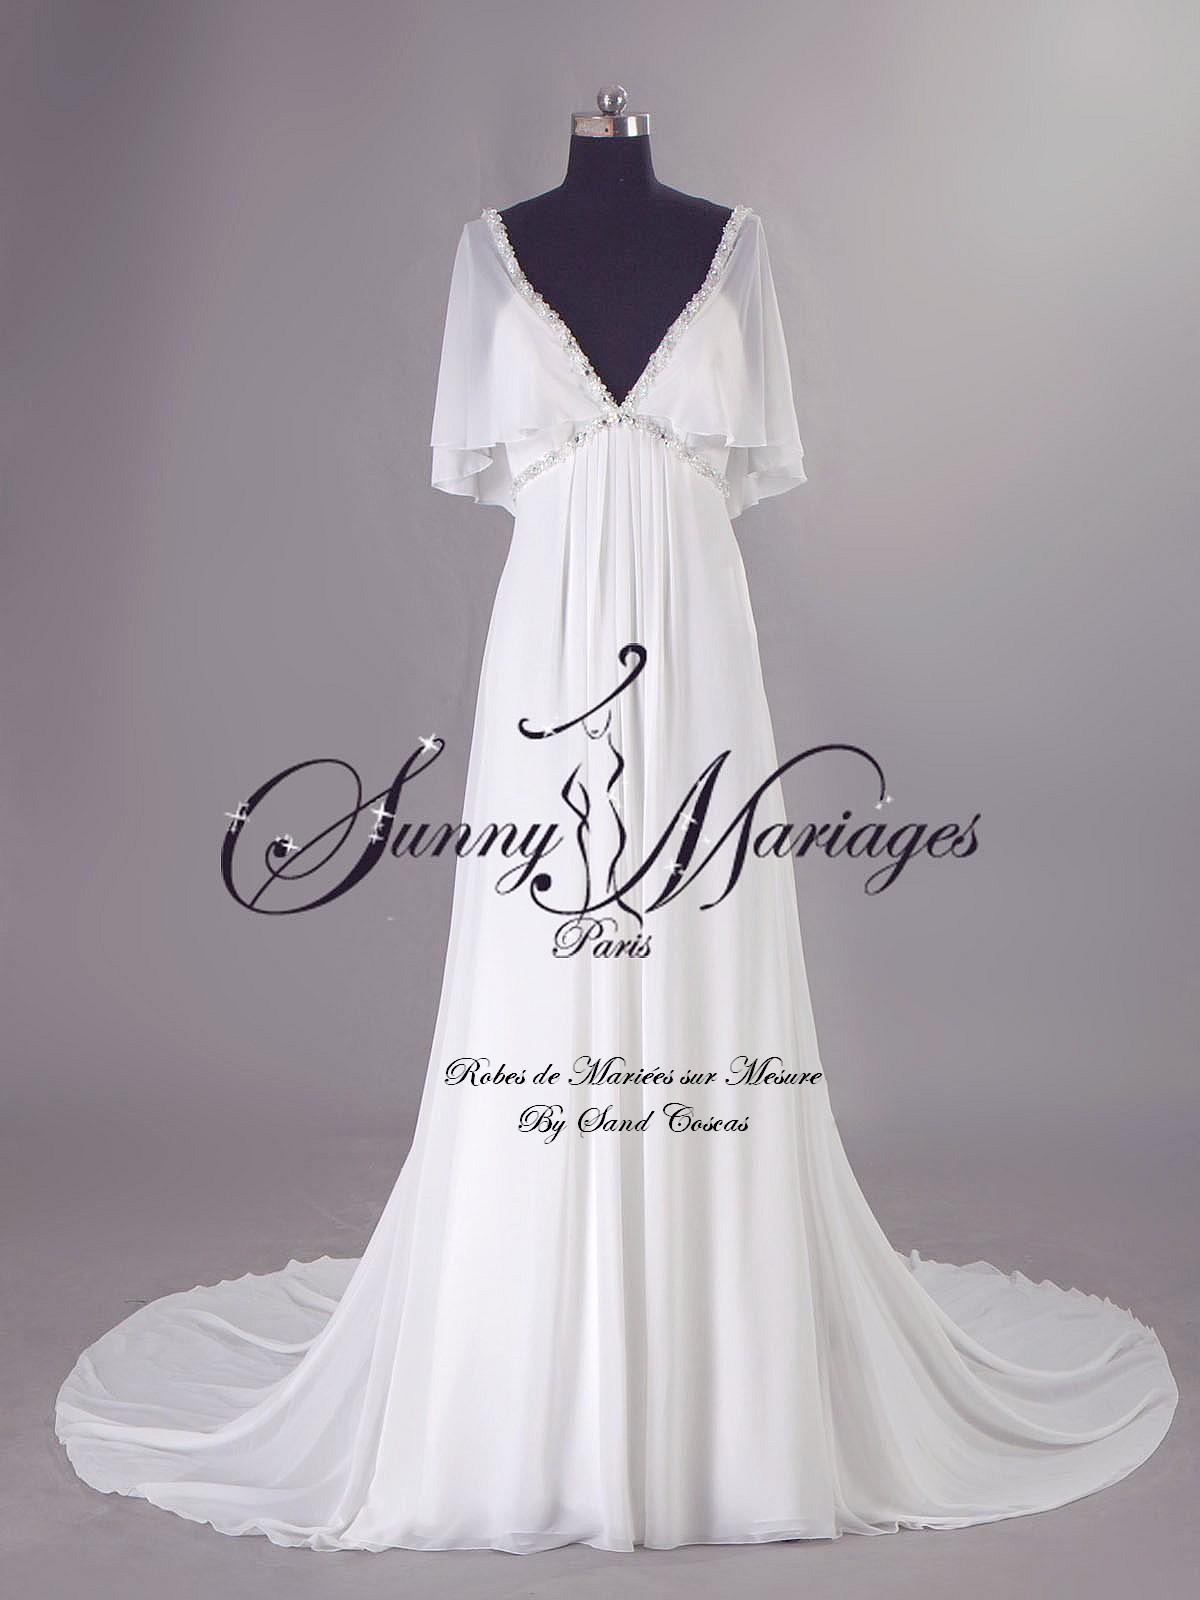 ... Sunny Mariage » robe de mariée » Robe de mariee empire « Lune